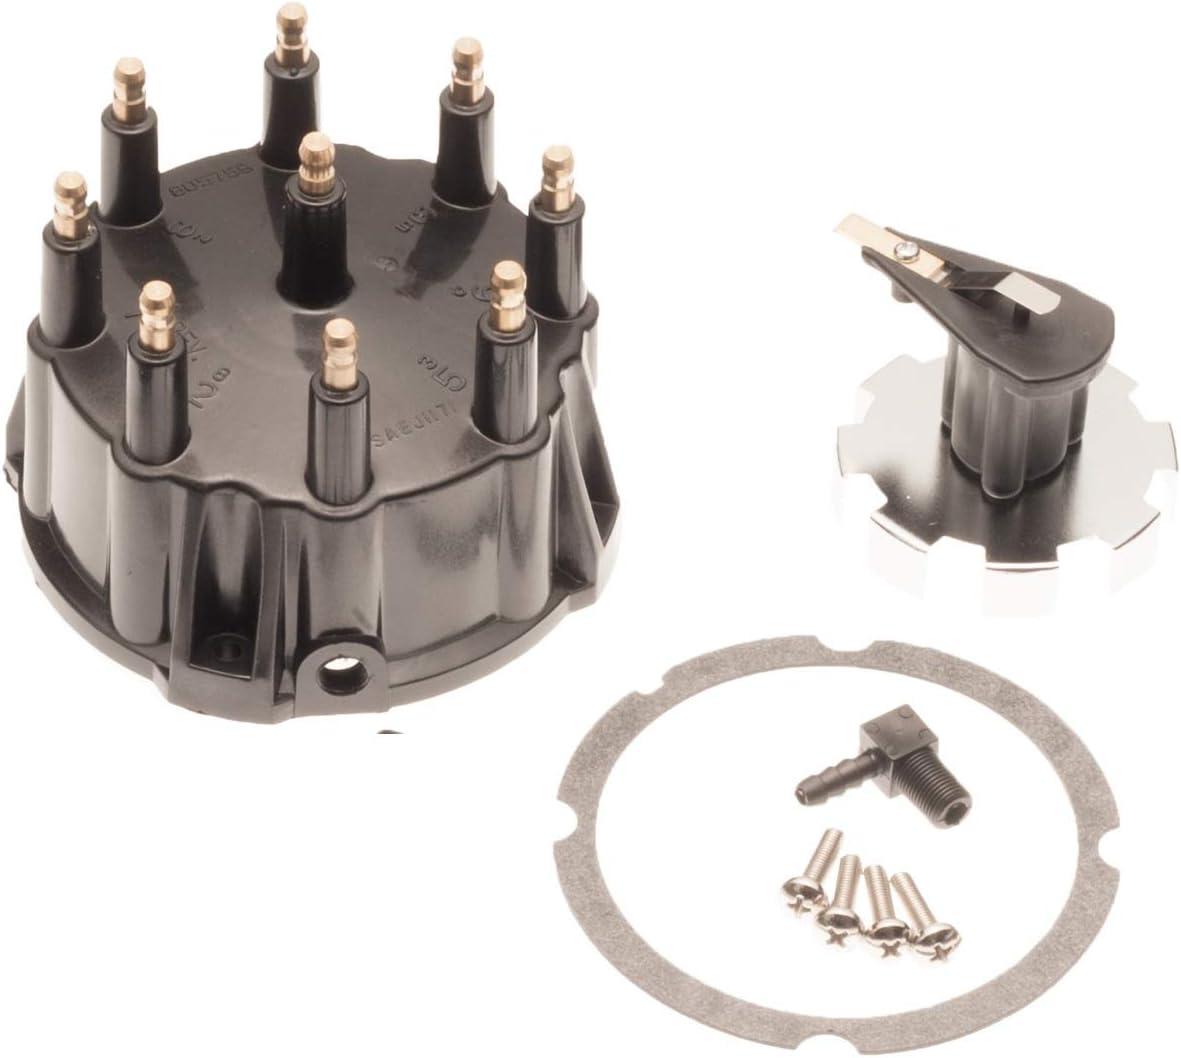 Titan Performance Mercruiser V8 Thunderbolt Distributor Cap /& Rotor Kit 5.0 5.7 7.4 8.2 805759Q3